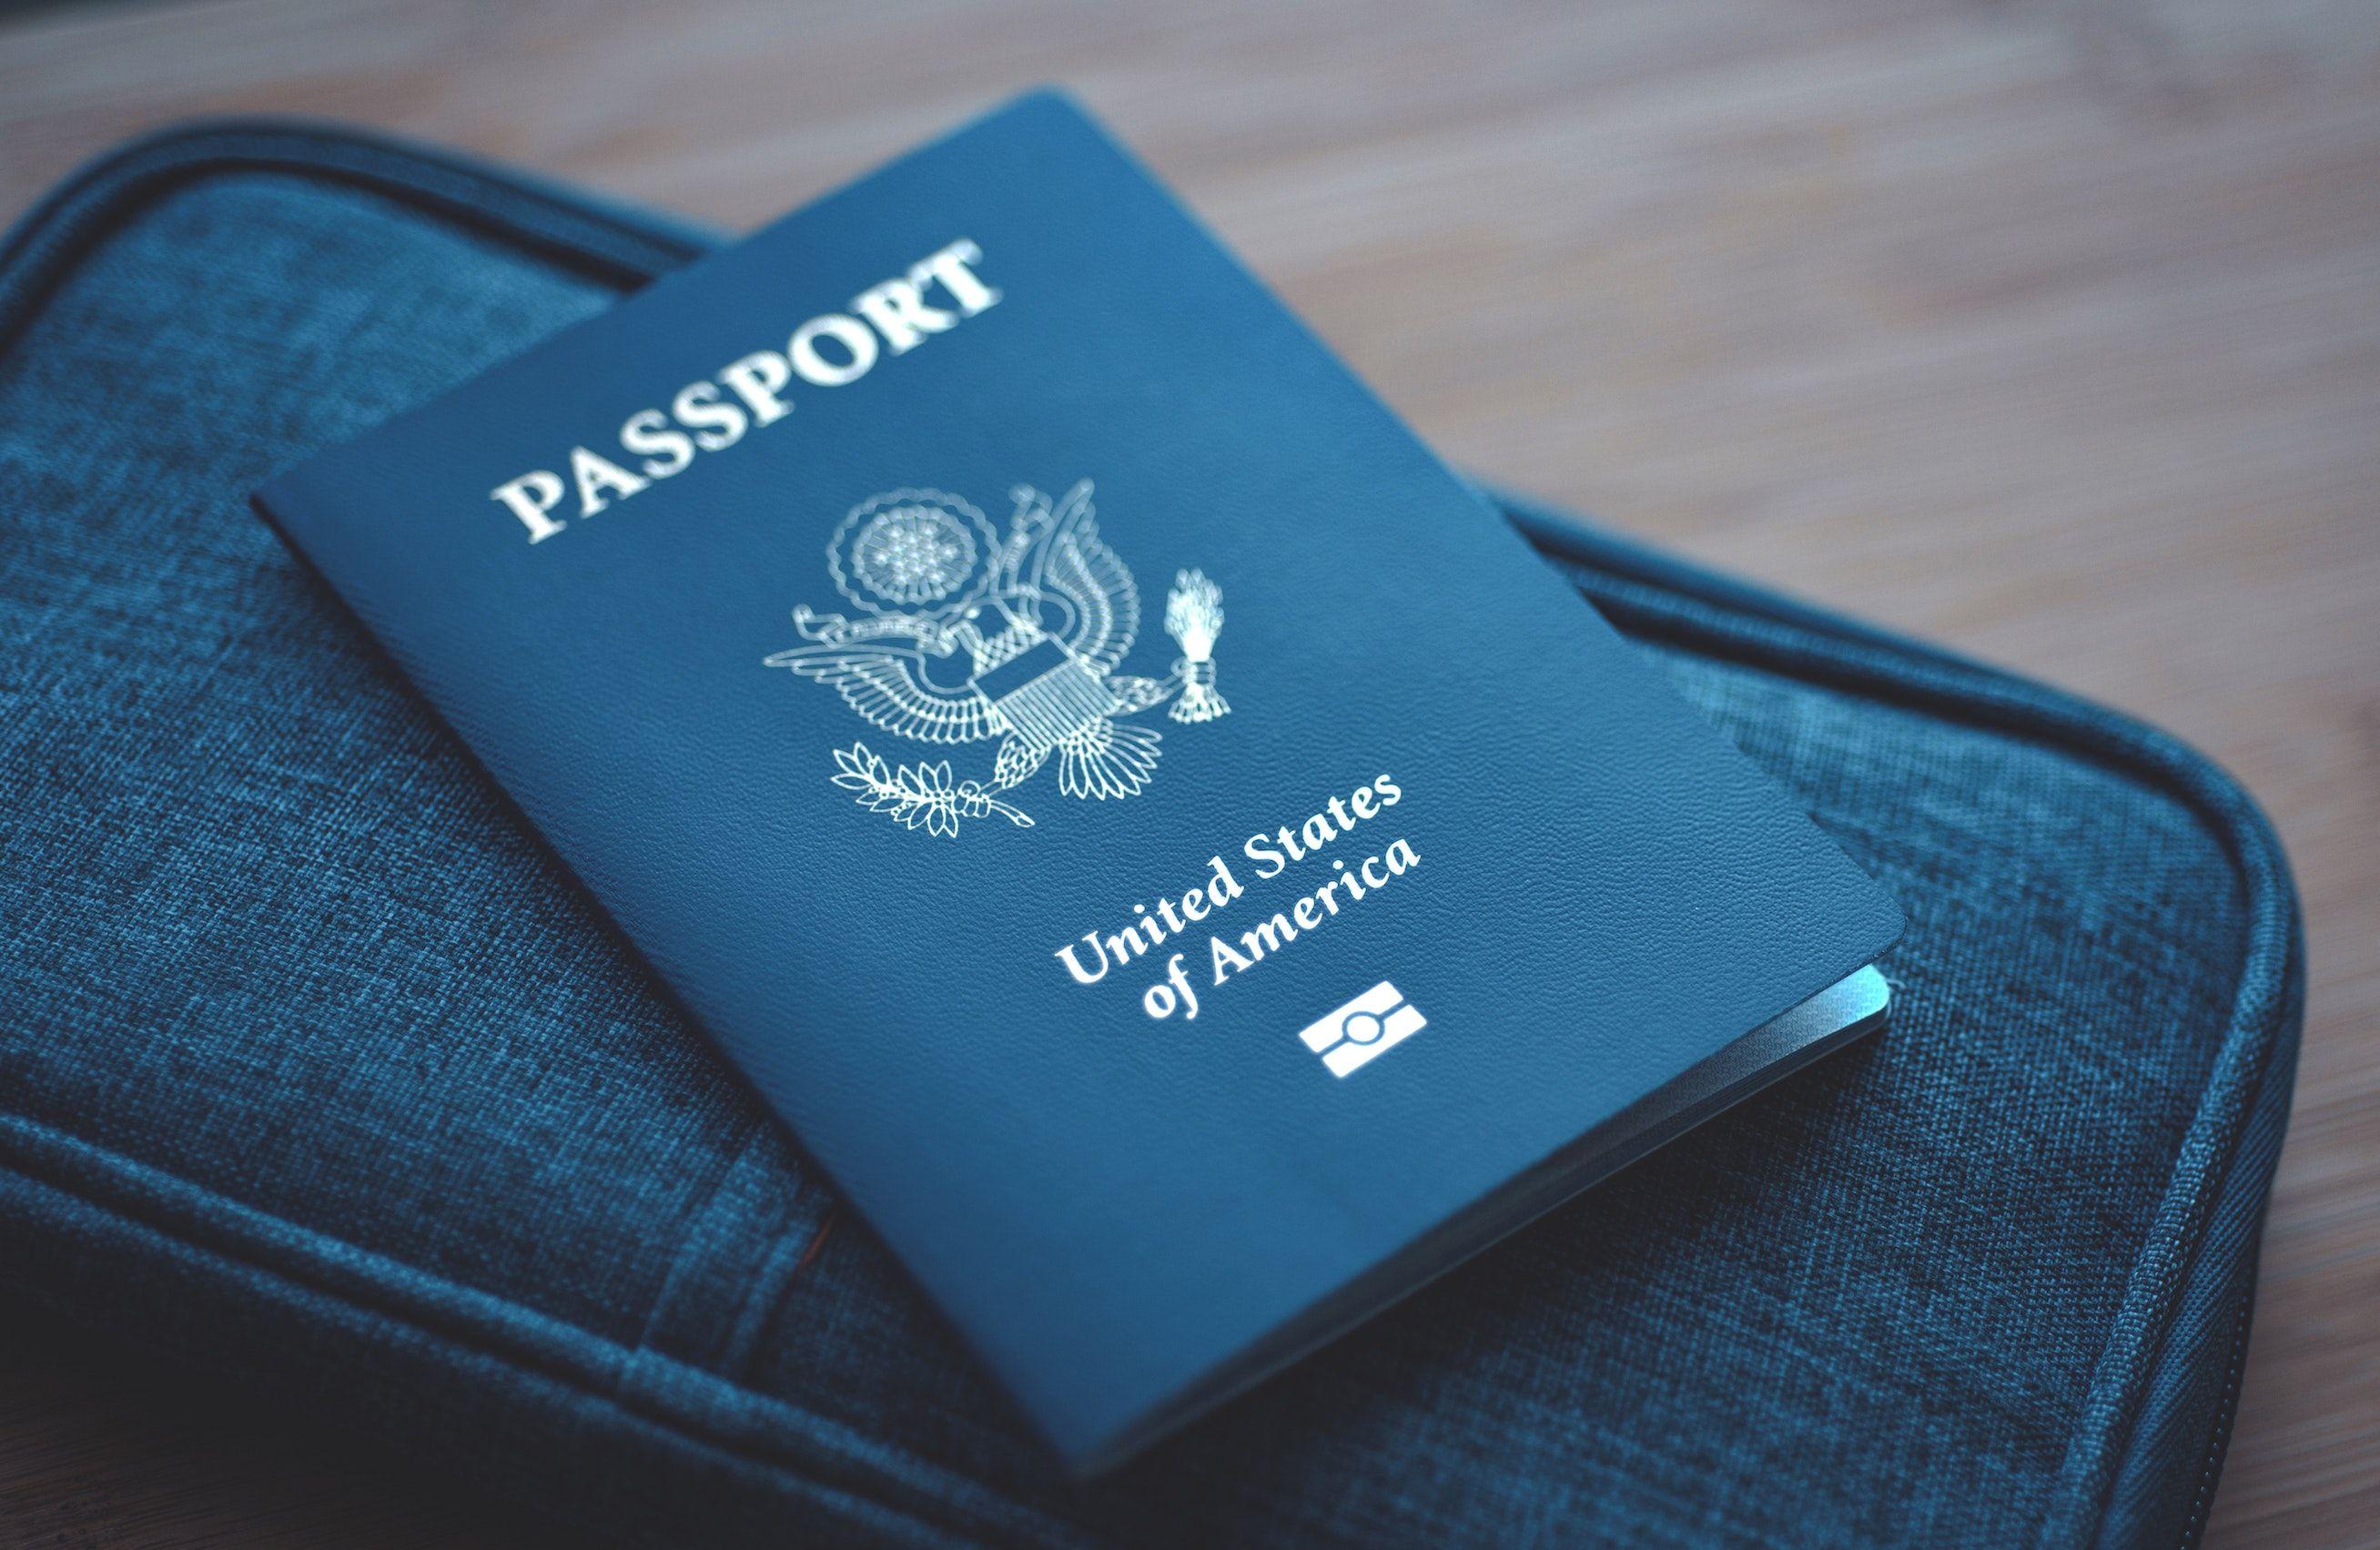 6f4ffcc04060ba948822cfc56c51e3b0 - How Long Does It Take To Get Passport Replaced